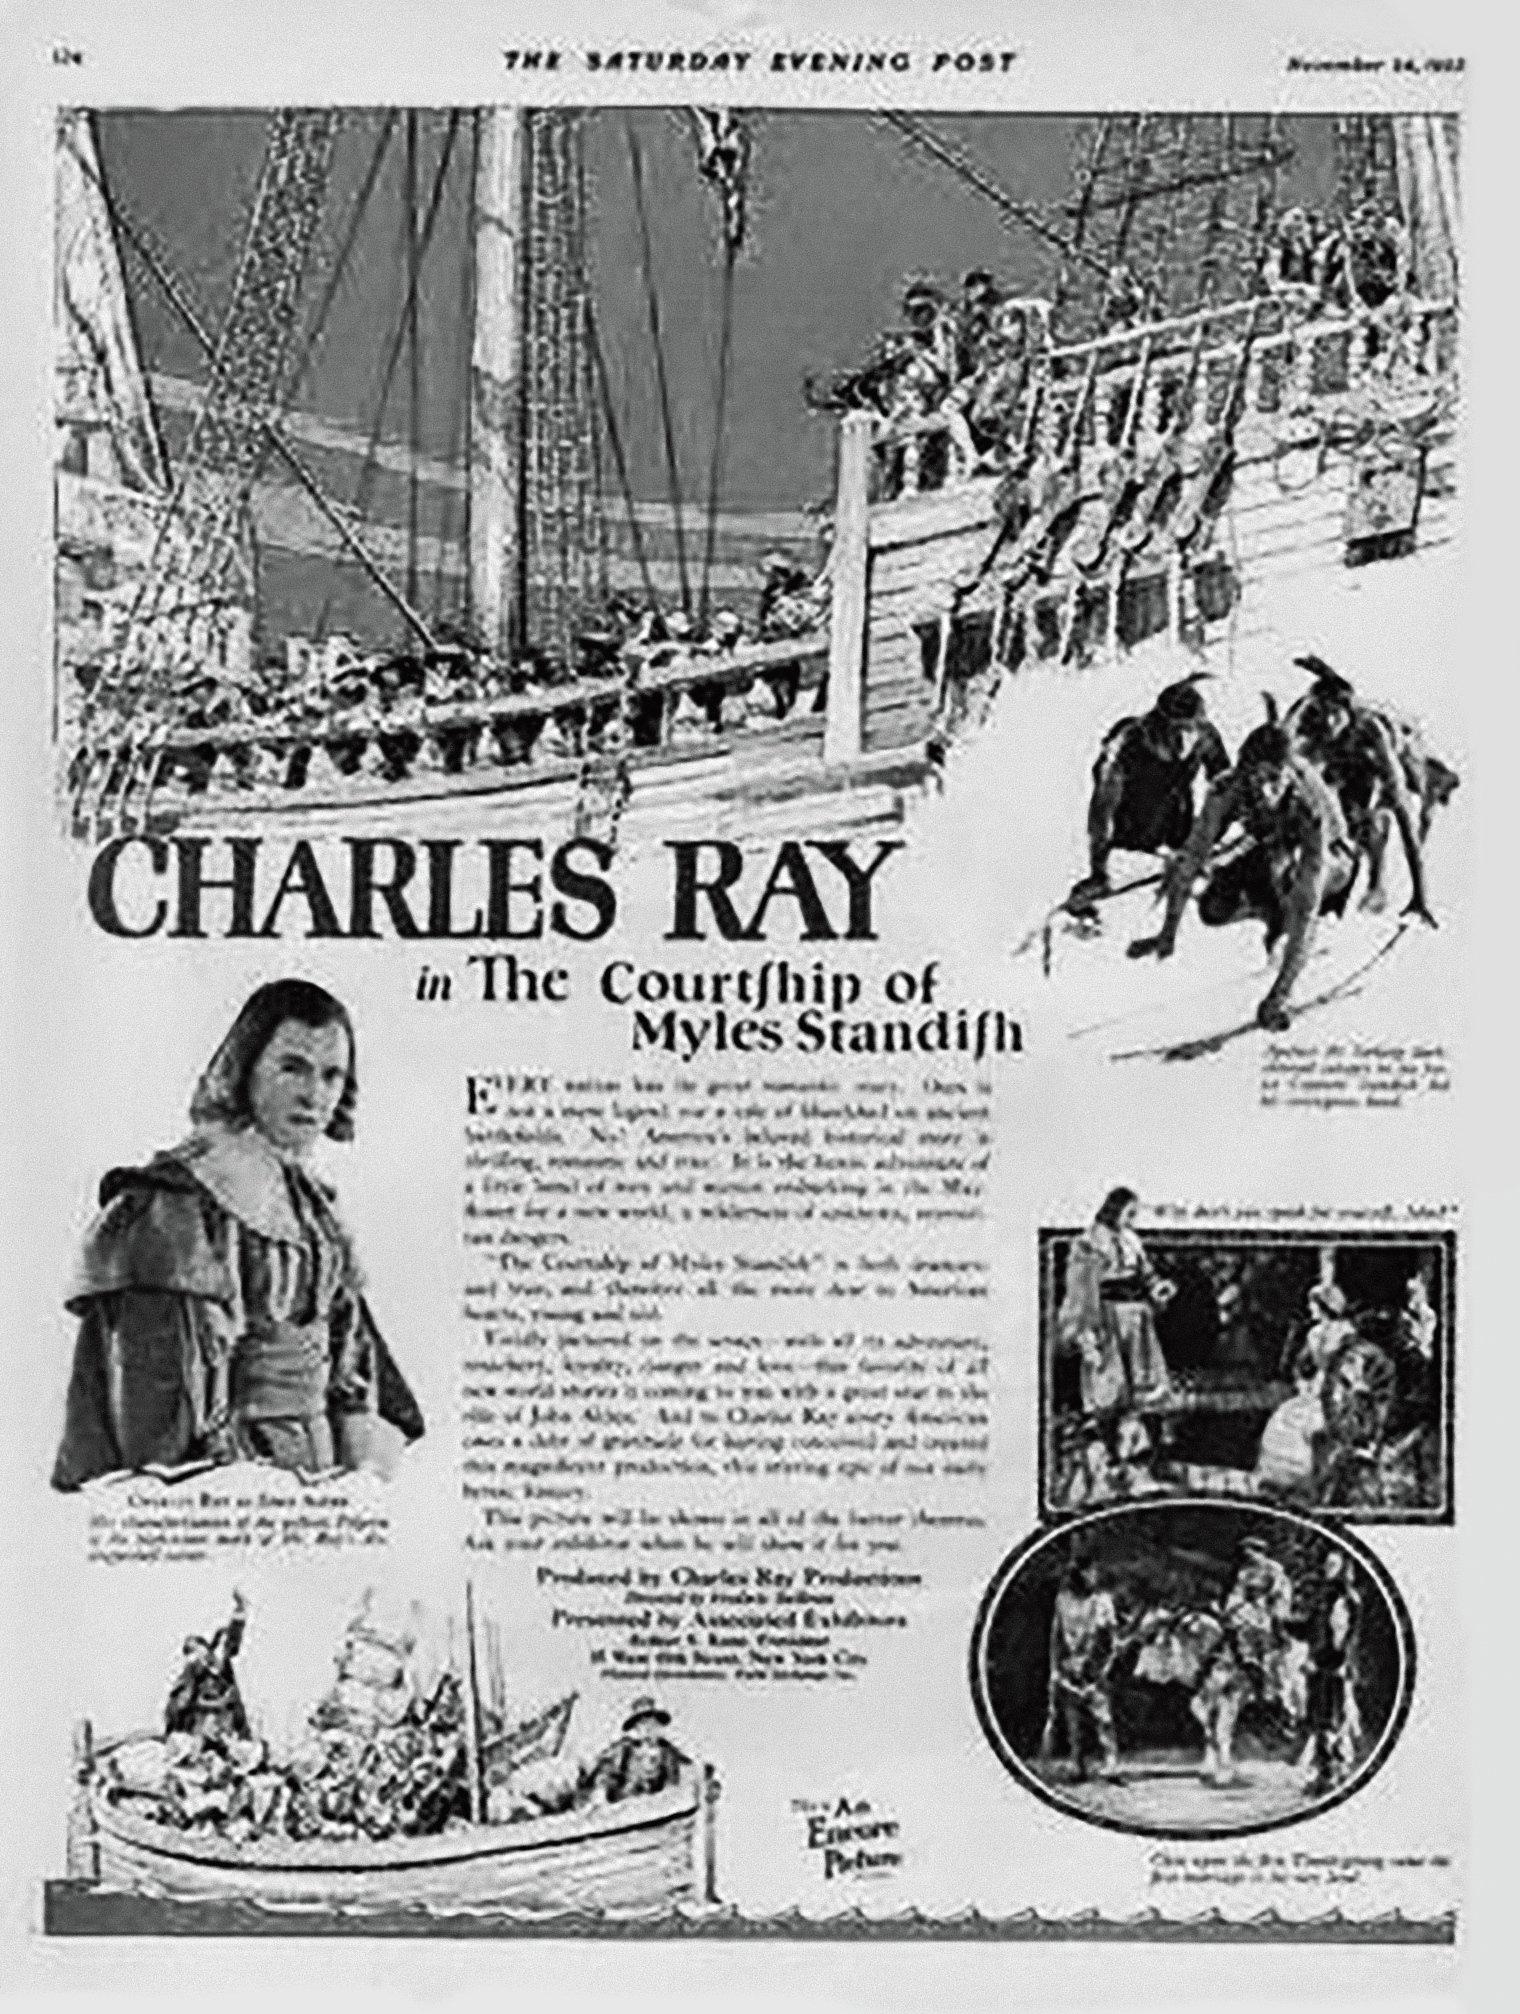 Charles Ray Films